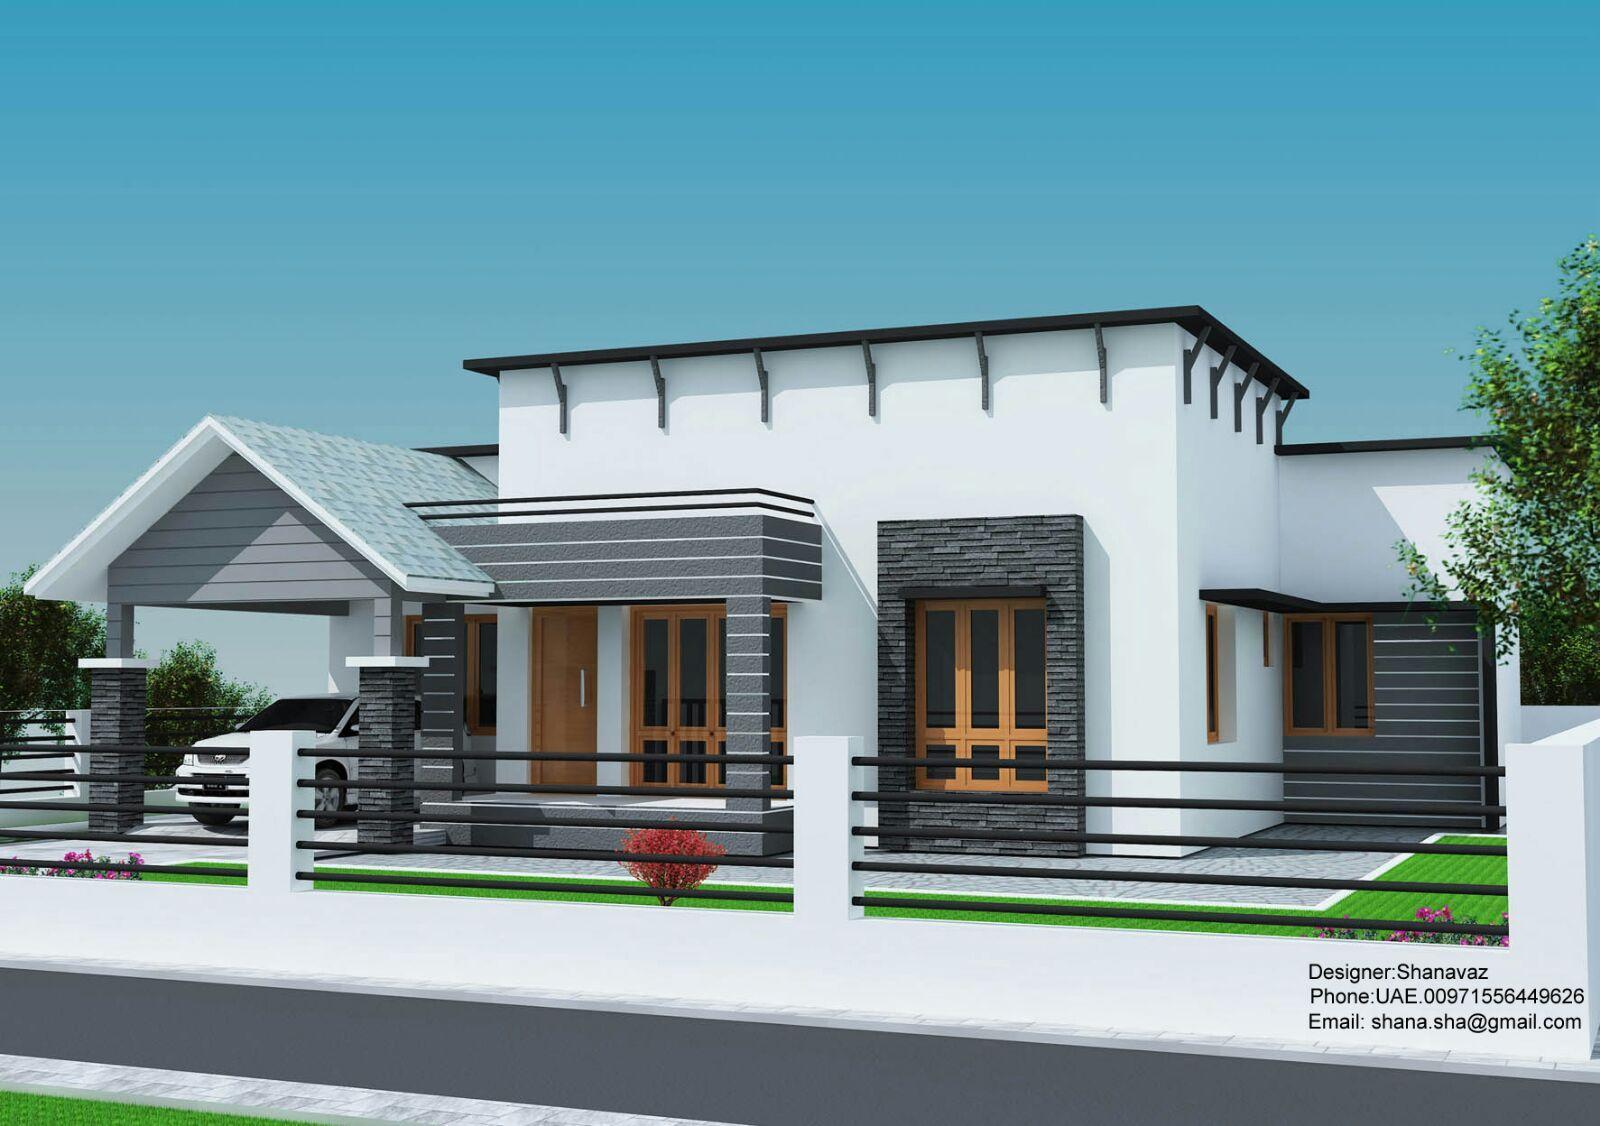 3 Bedroom Cute Kerala Home Plan Budget 3 Bedroom Kerala